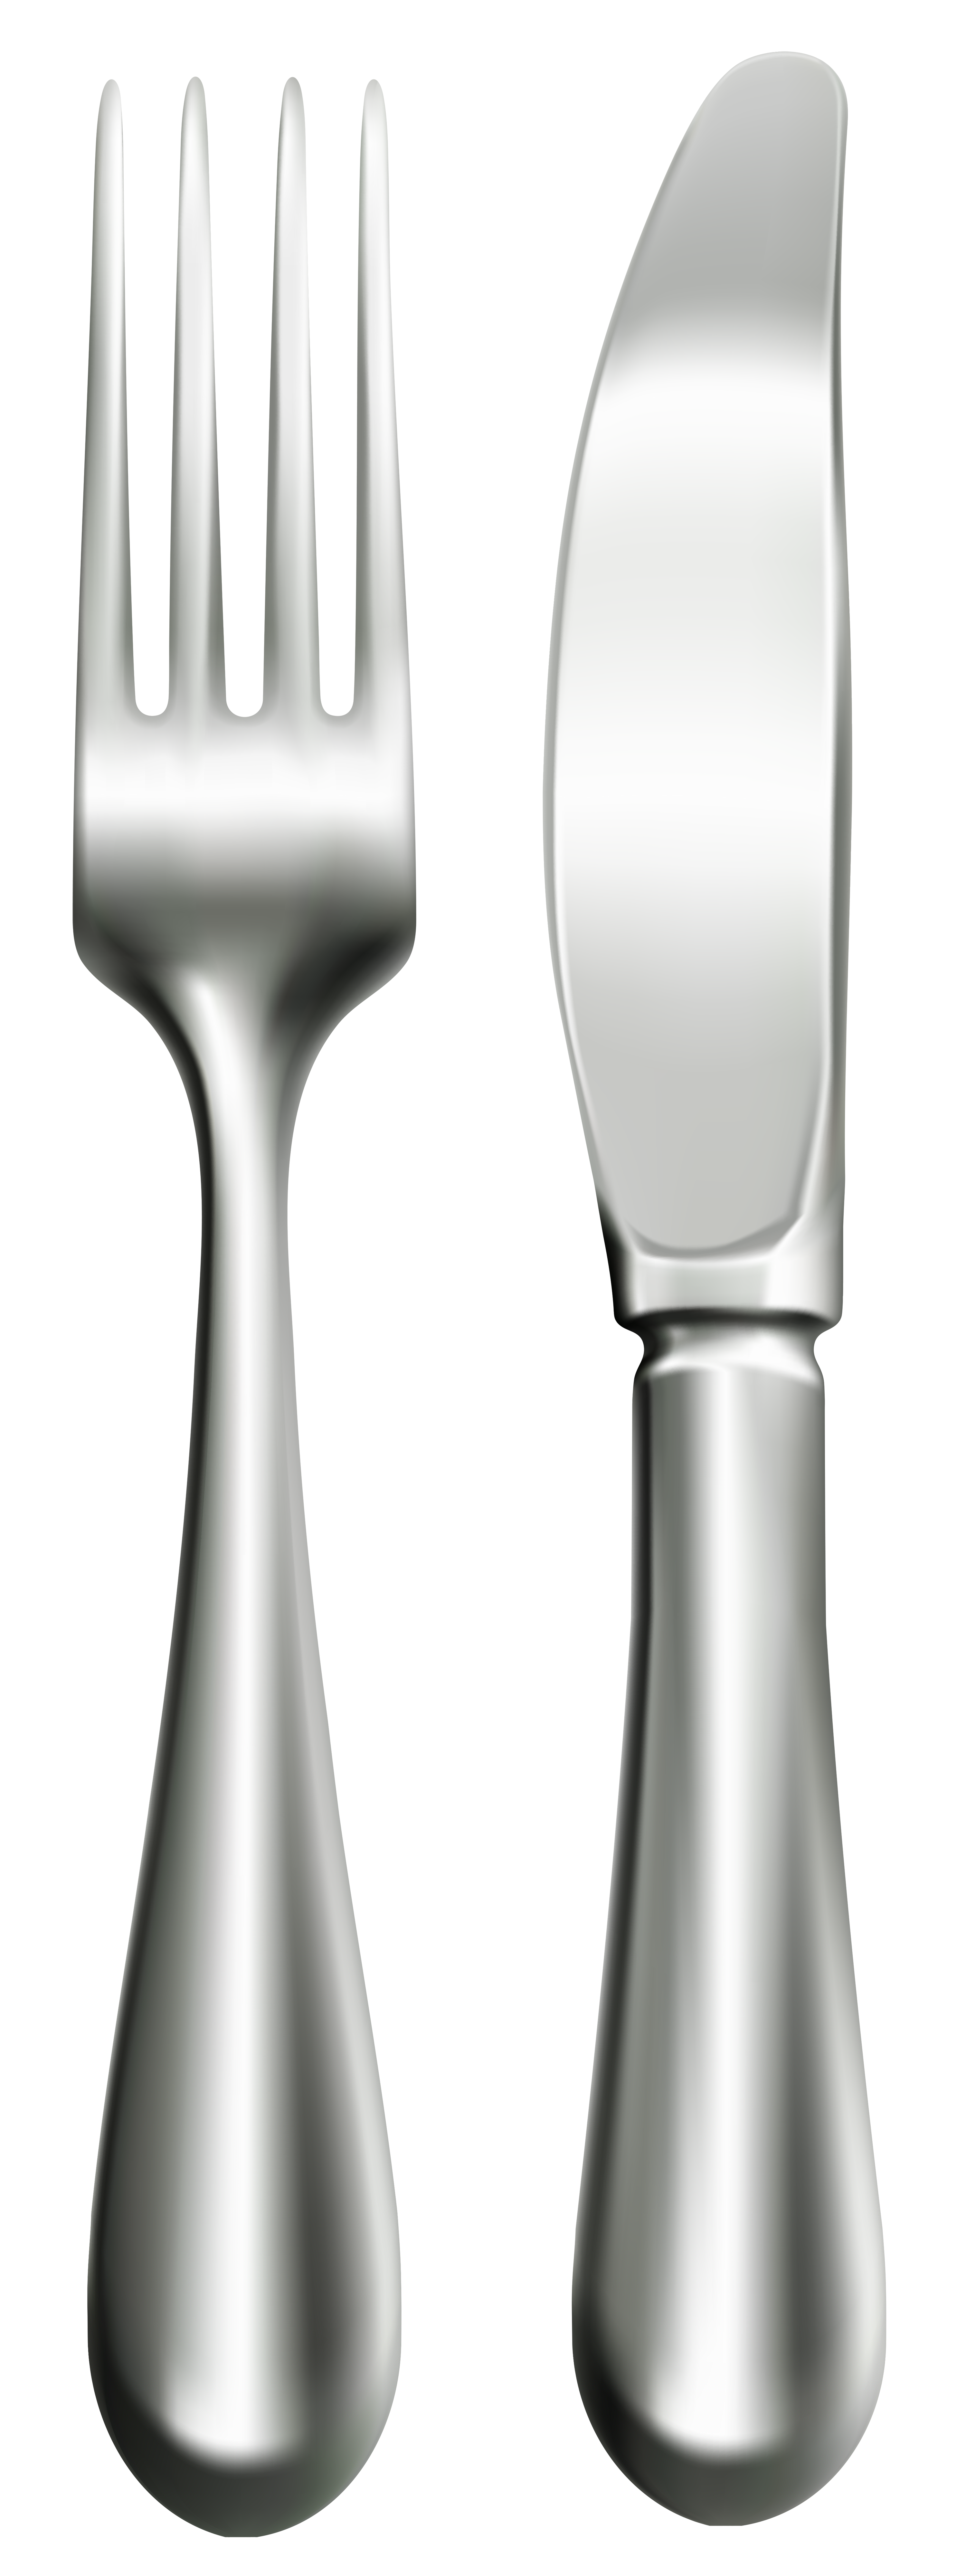 Khife clipart clip Knives collection Clip Clip art